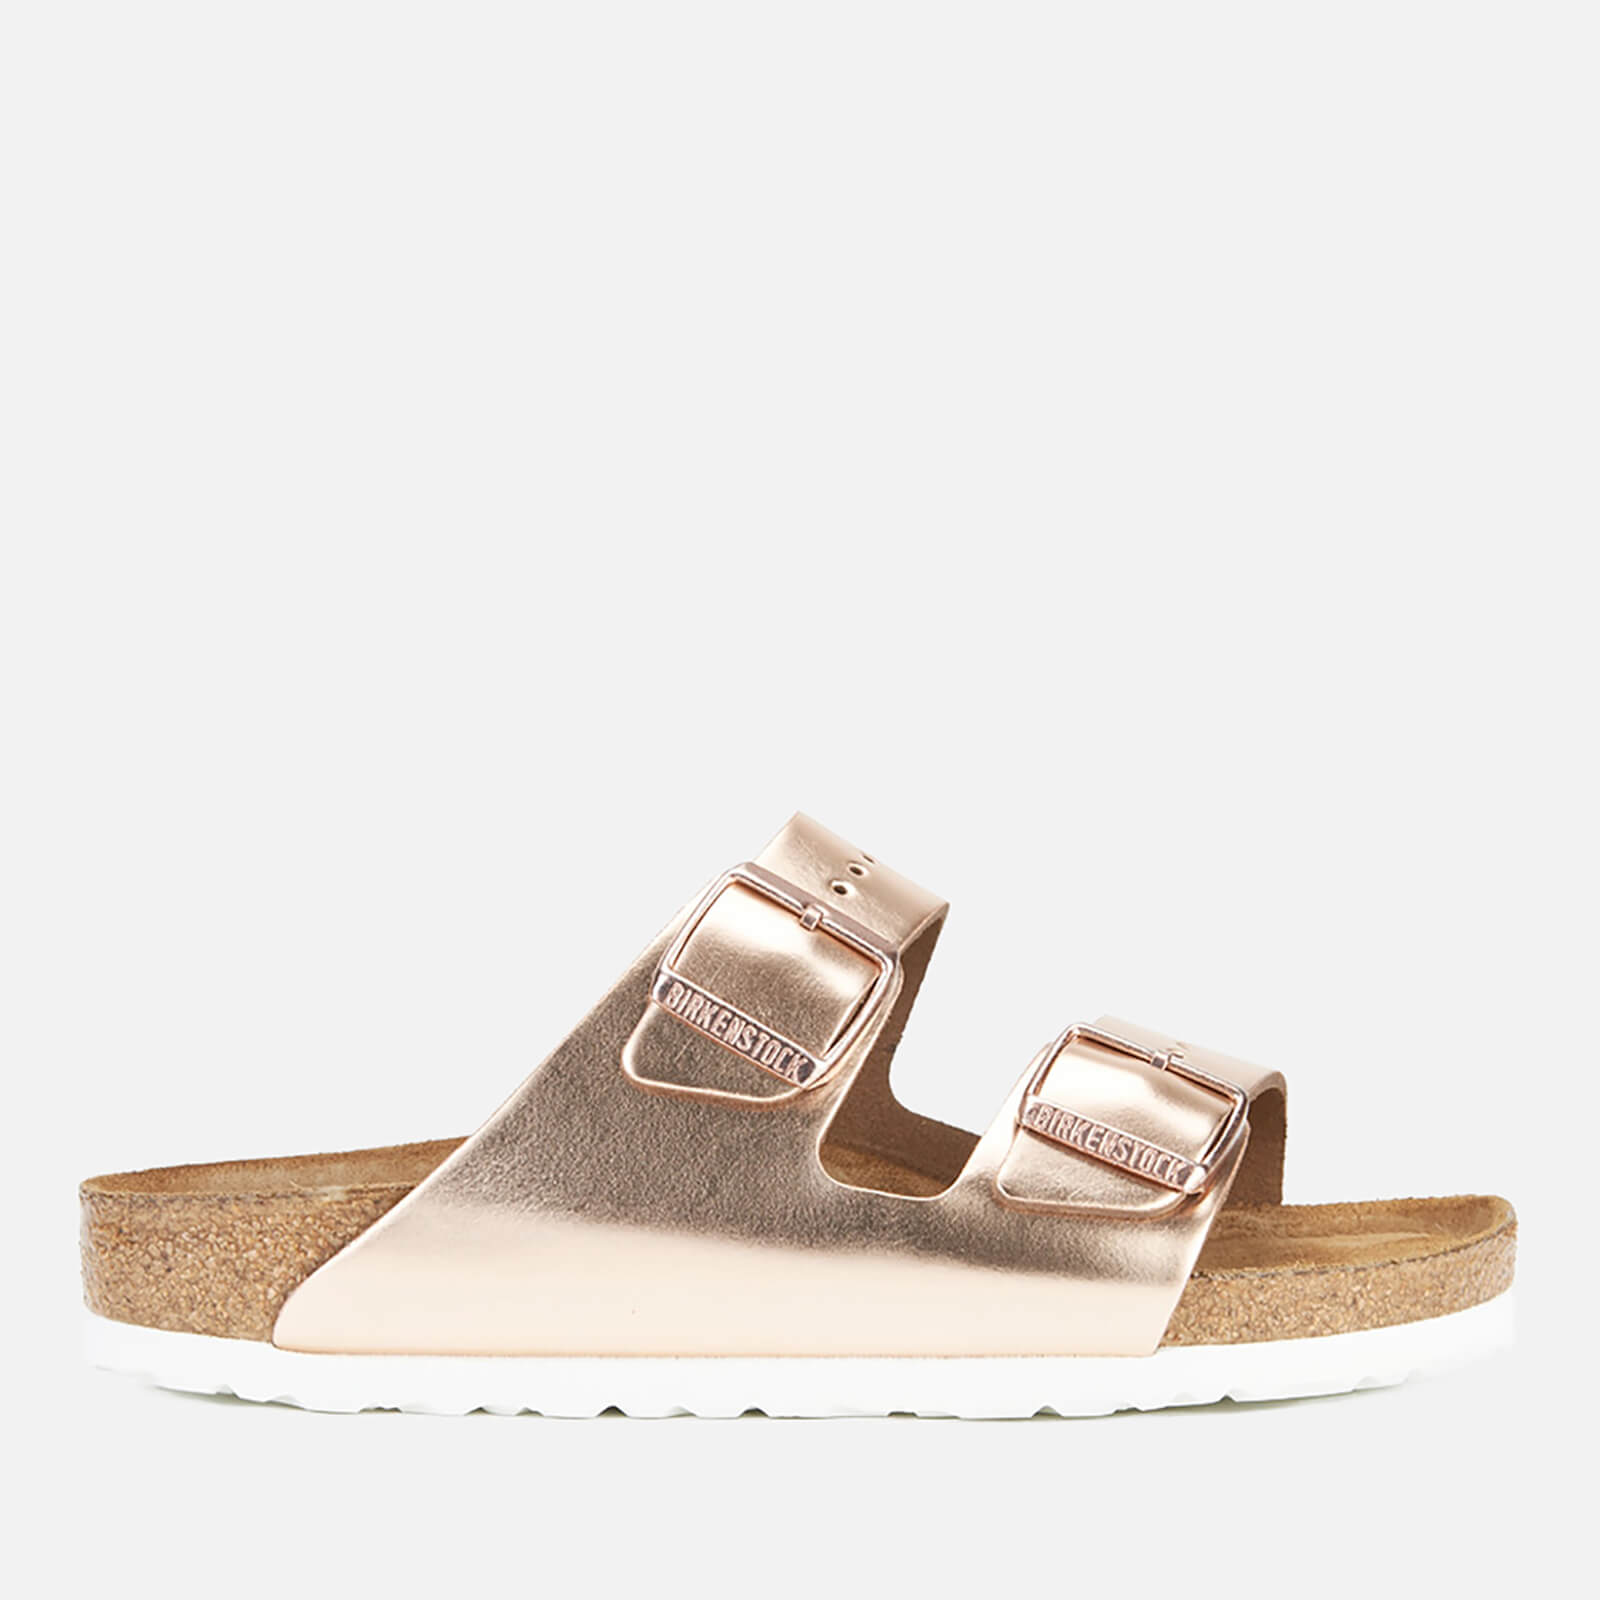 Birkenstock Arizona 女士金属色博肯凉鞋